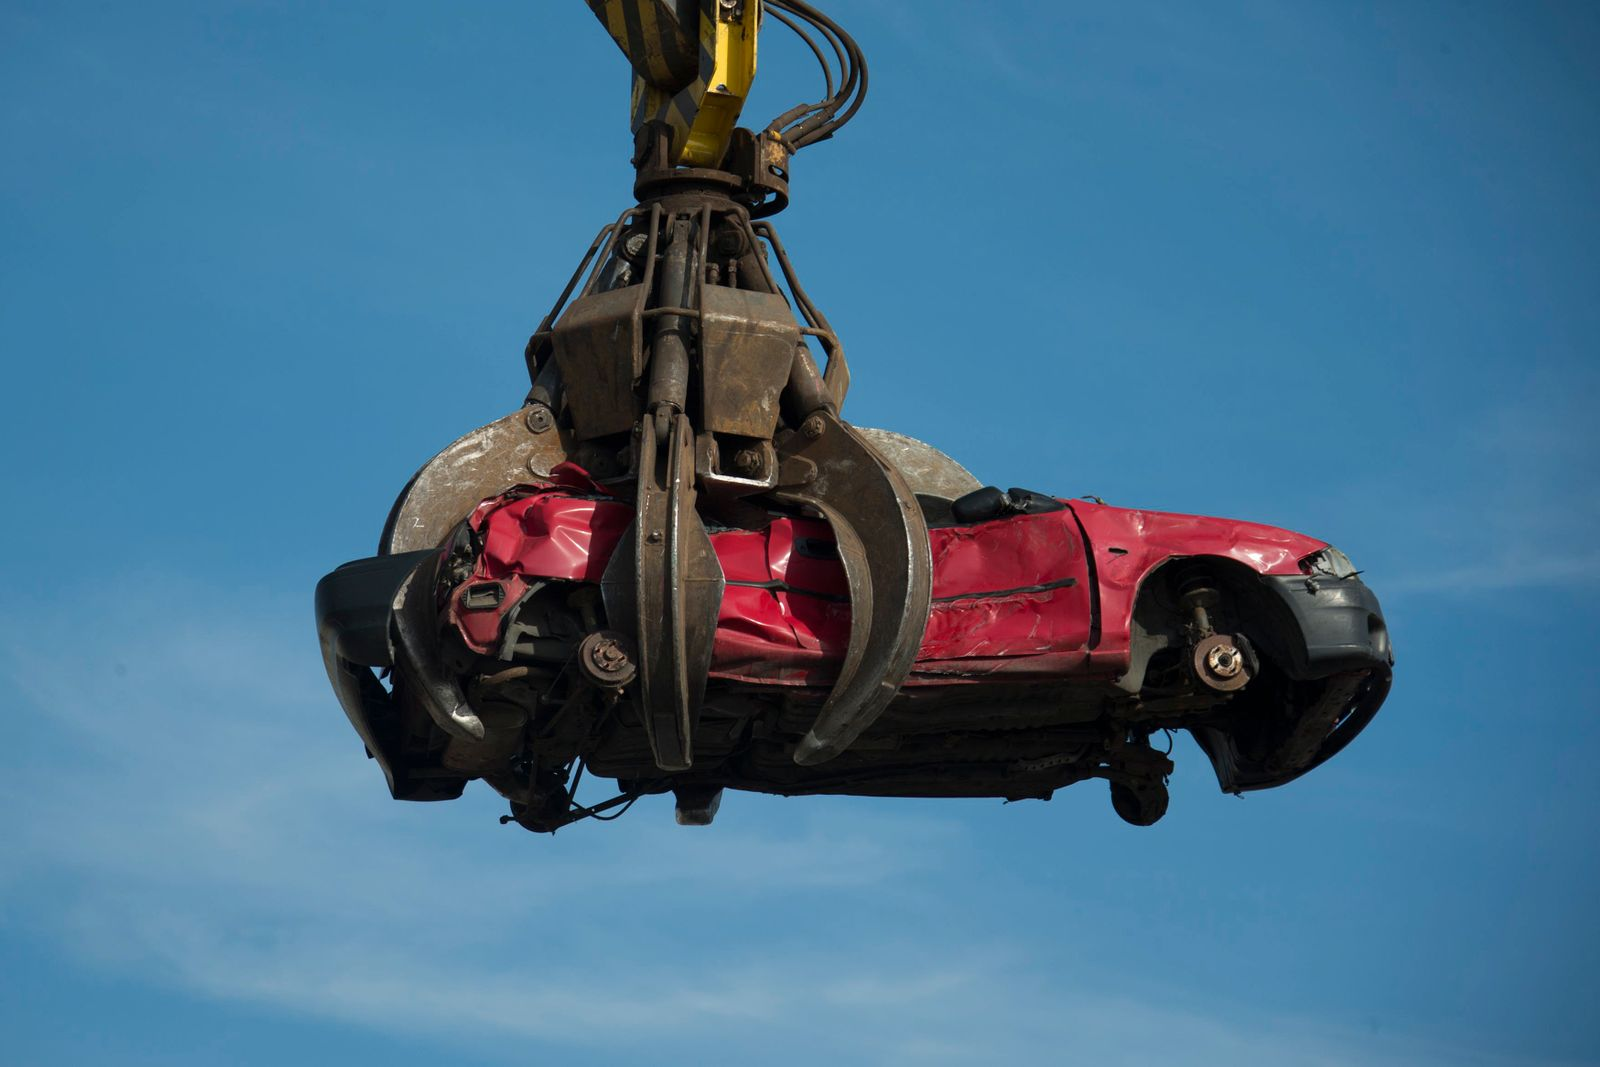 Crane lifts car body at Scholz scrap metal recycling plant in Espenhain